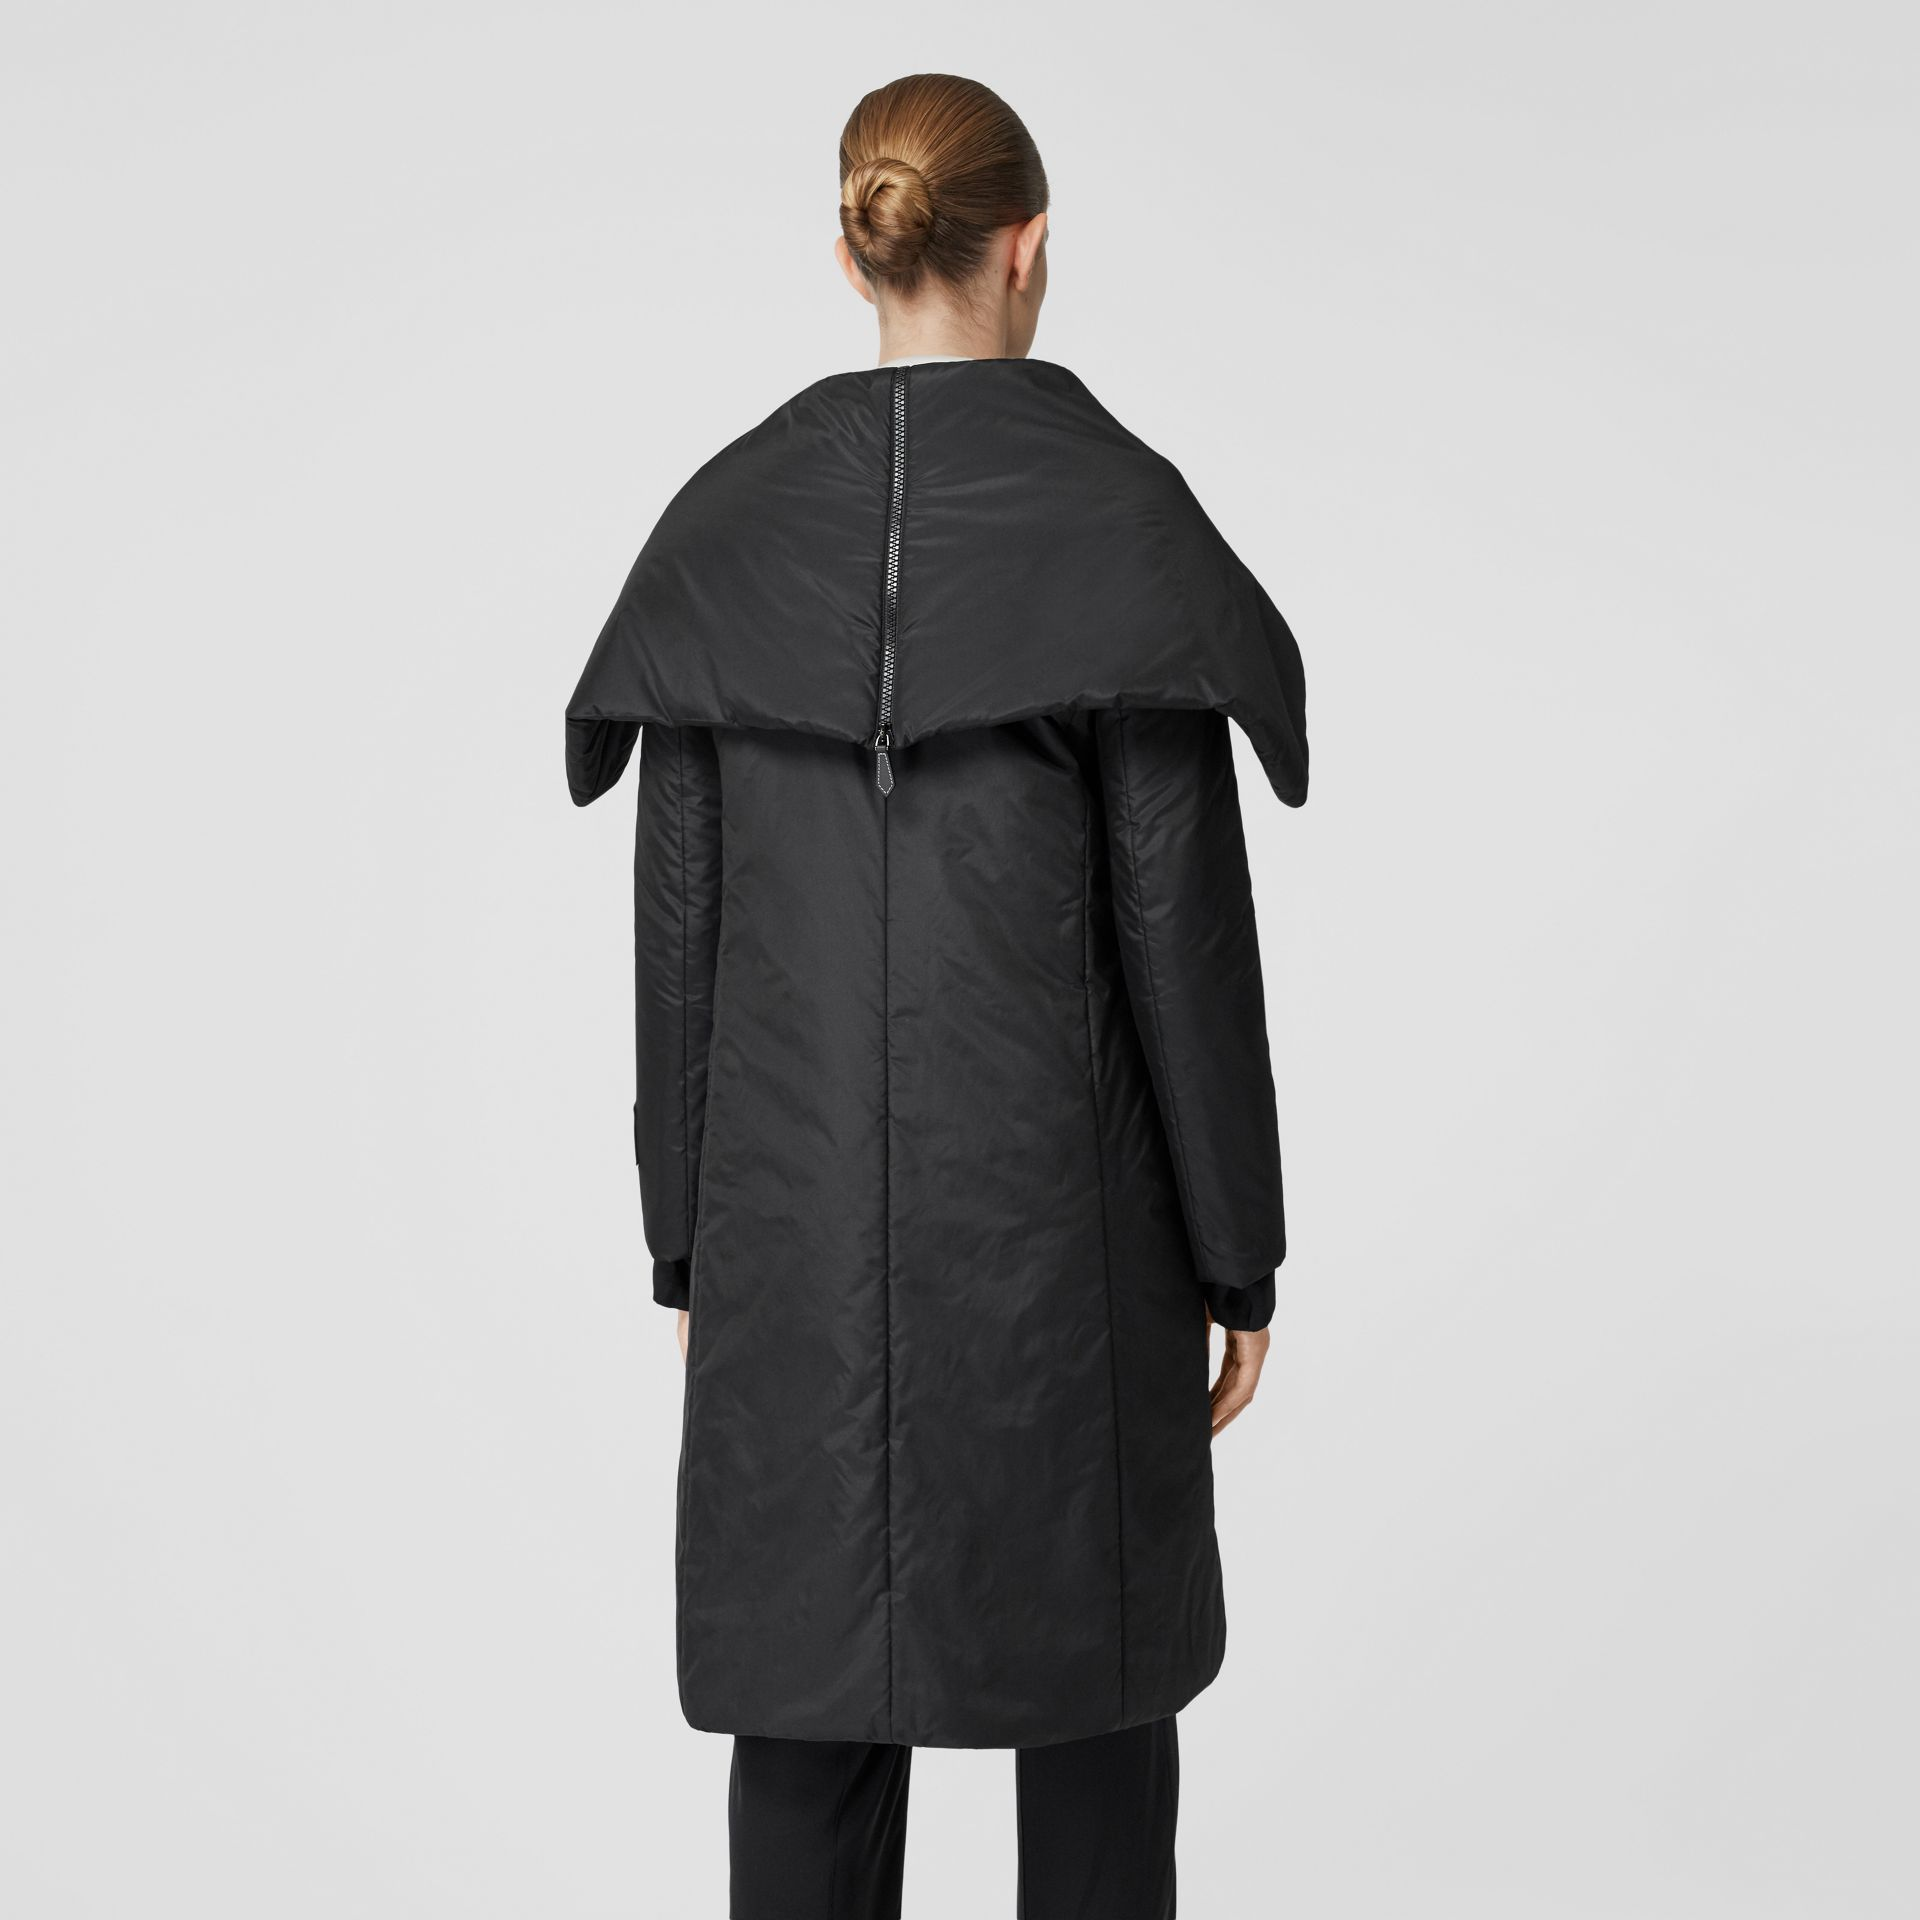 Cape Detail Silk Blend Wrap Coat in Black - Women | Burberry Singapore - gallery image 2